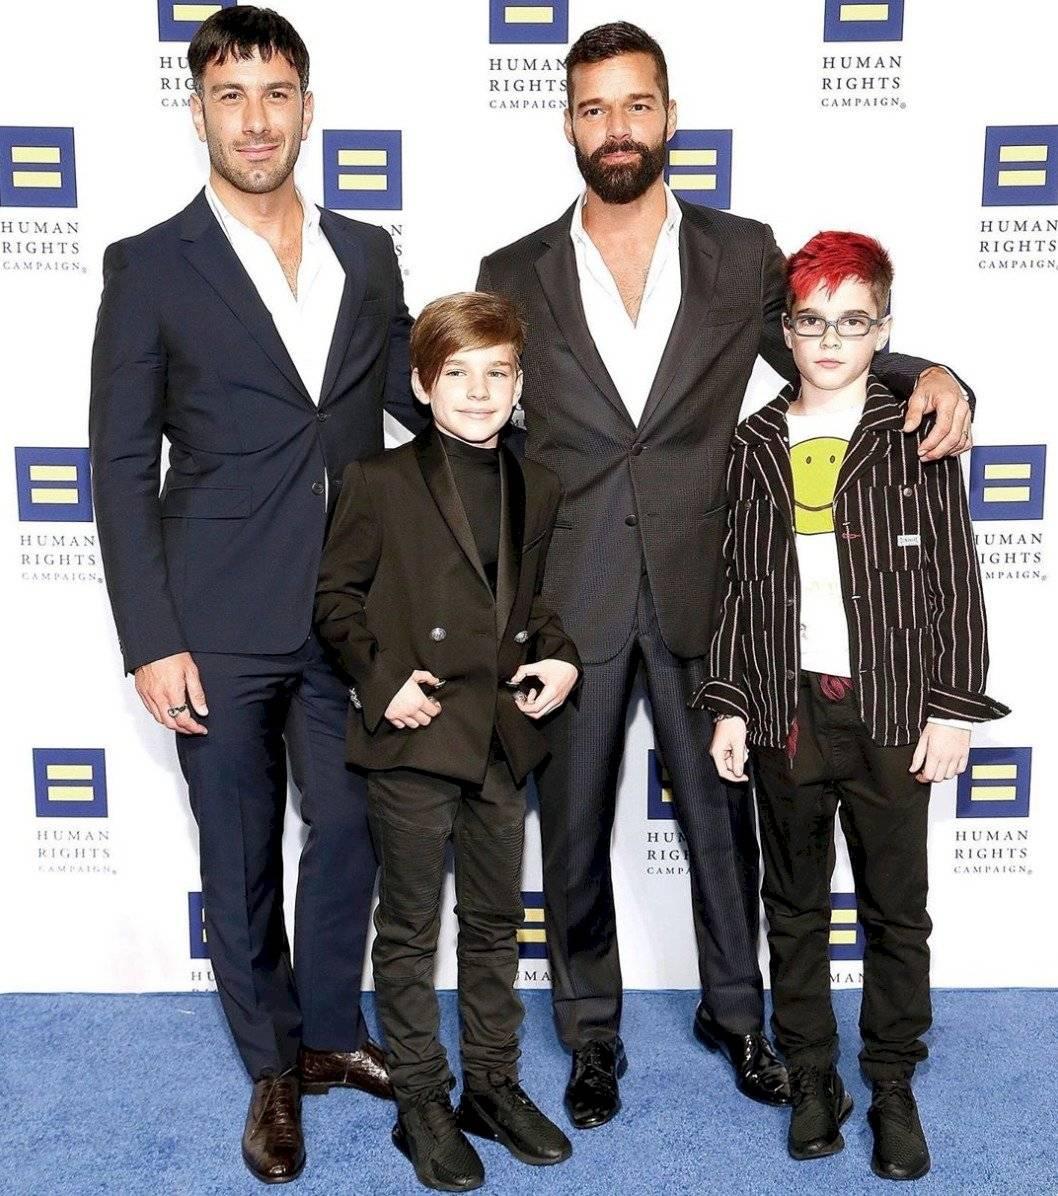 hijo de Ricky Martin